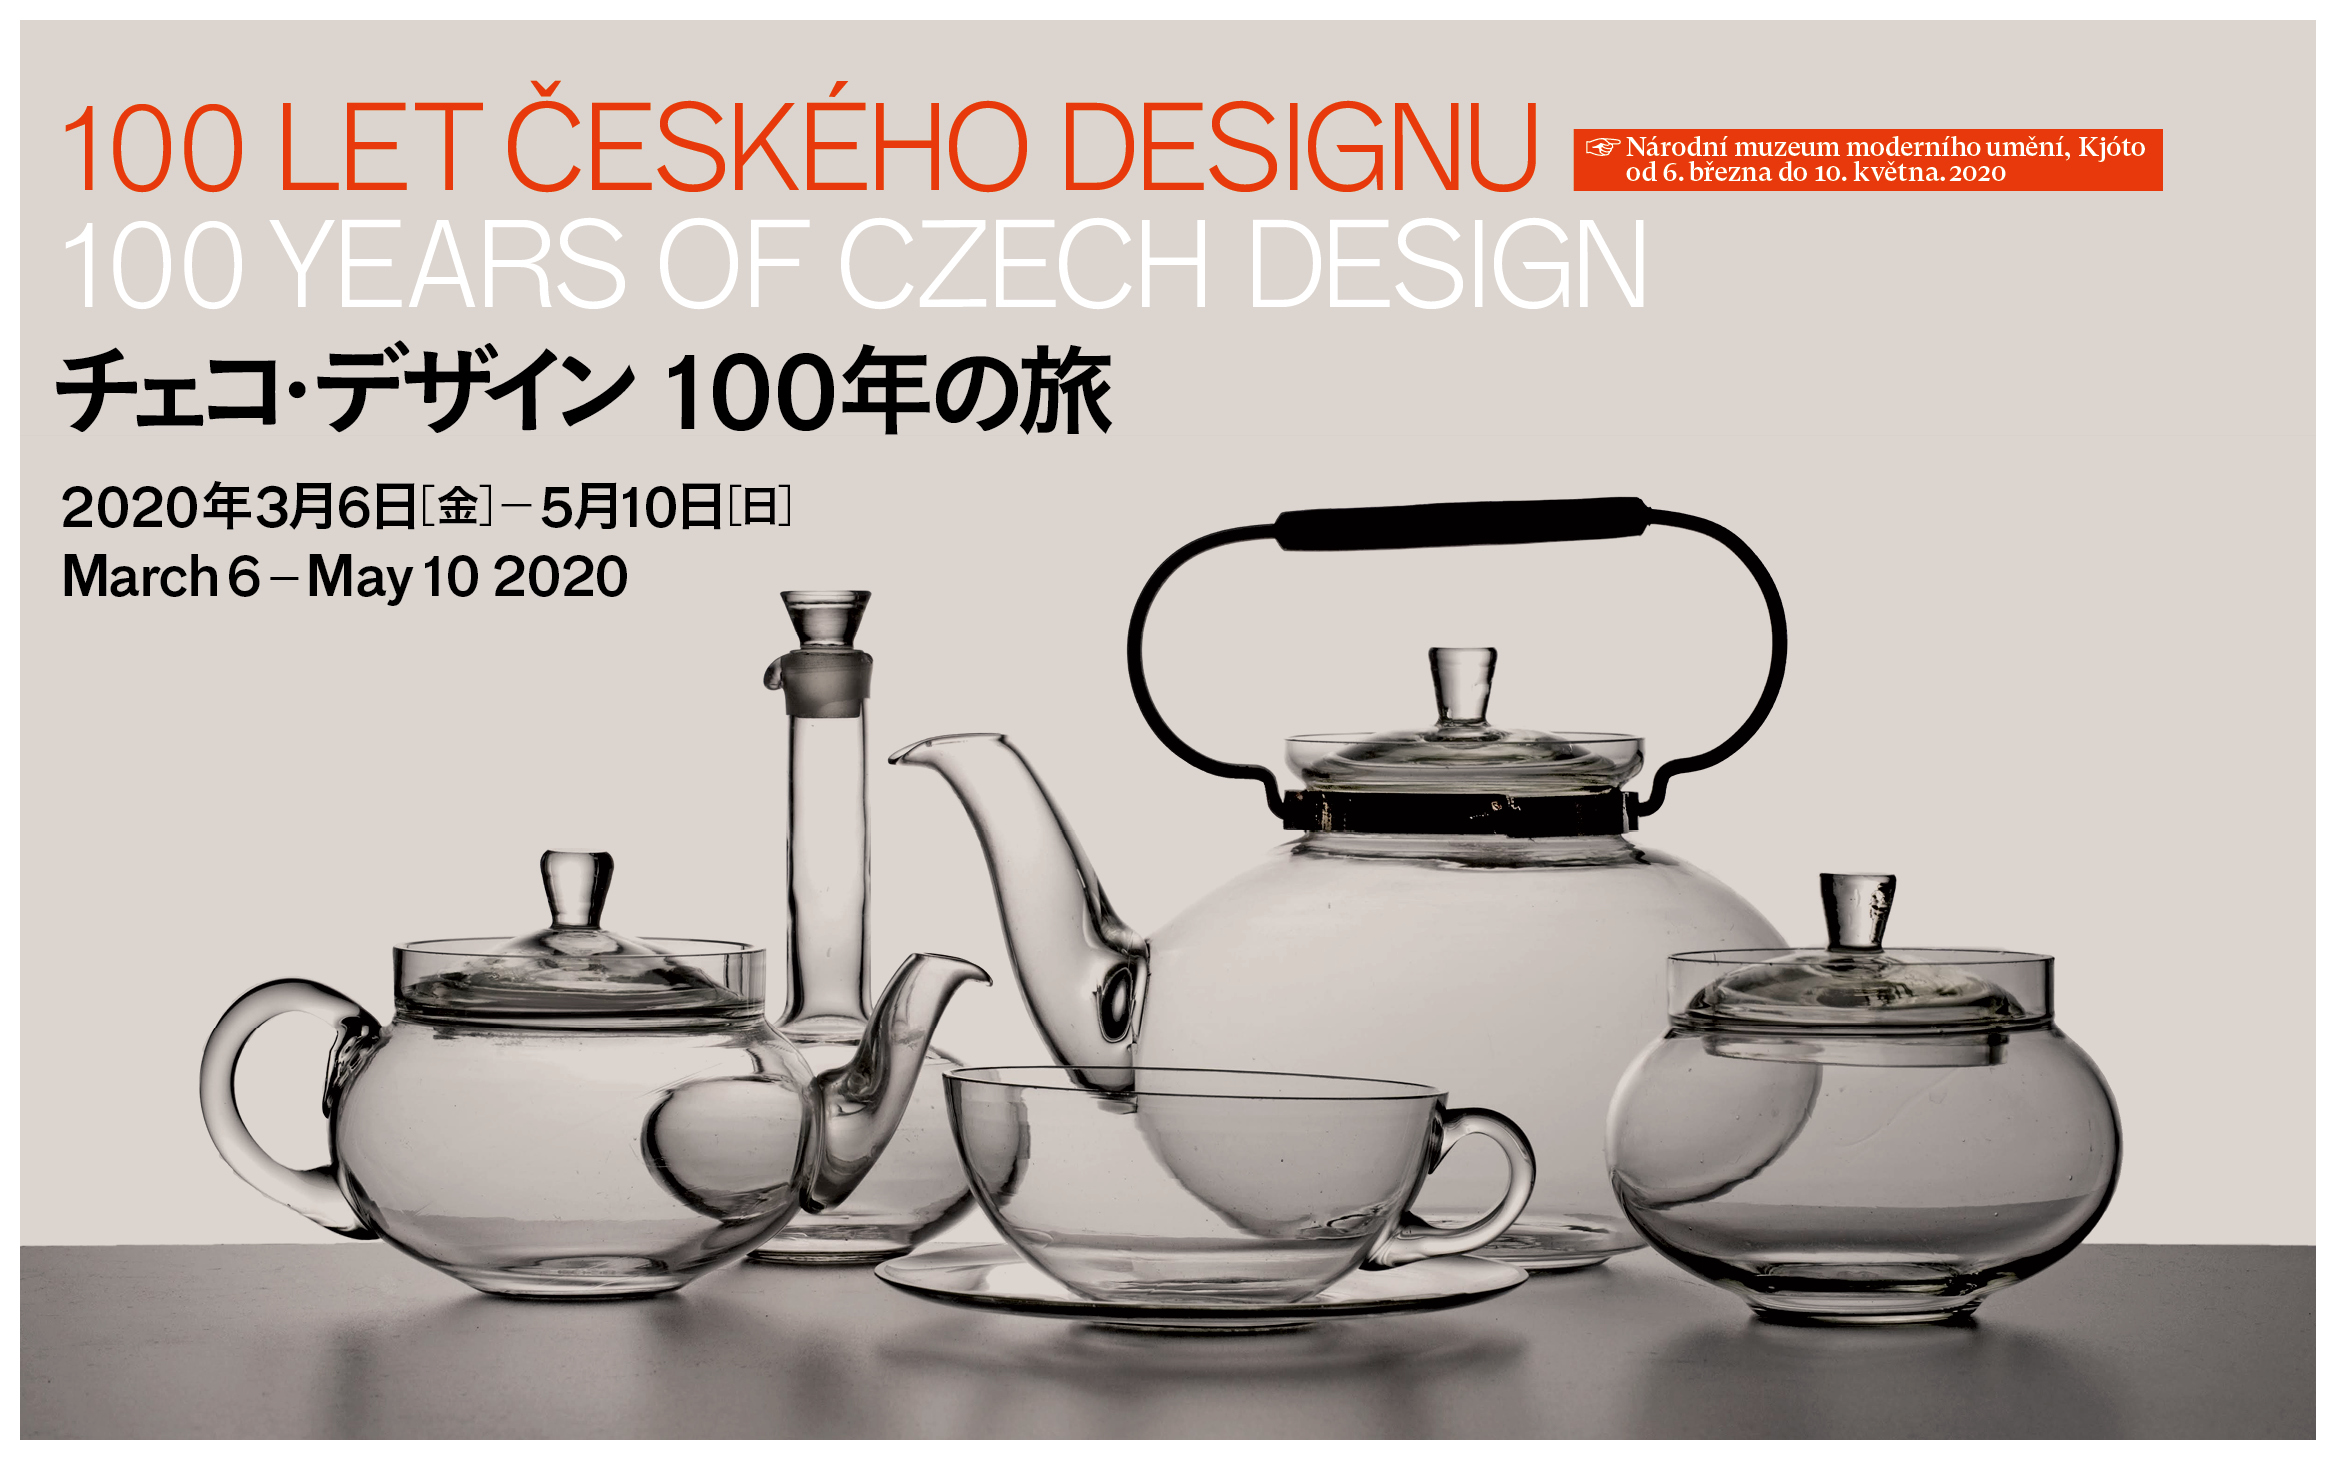 100 Years of Czech Design